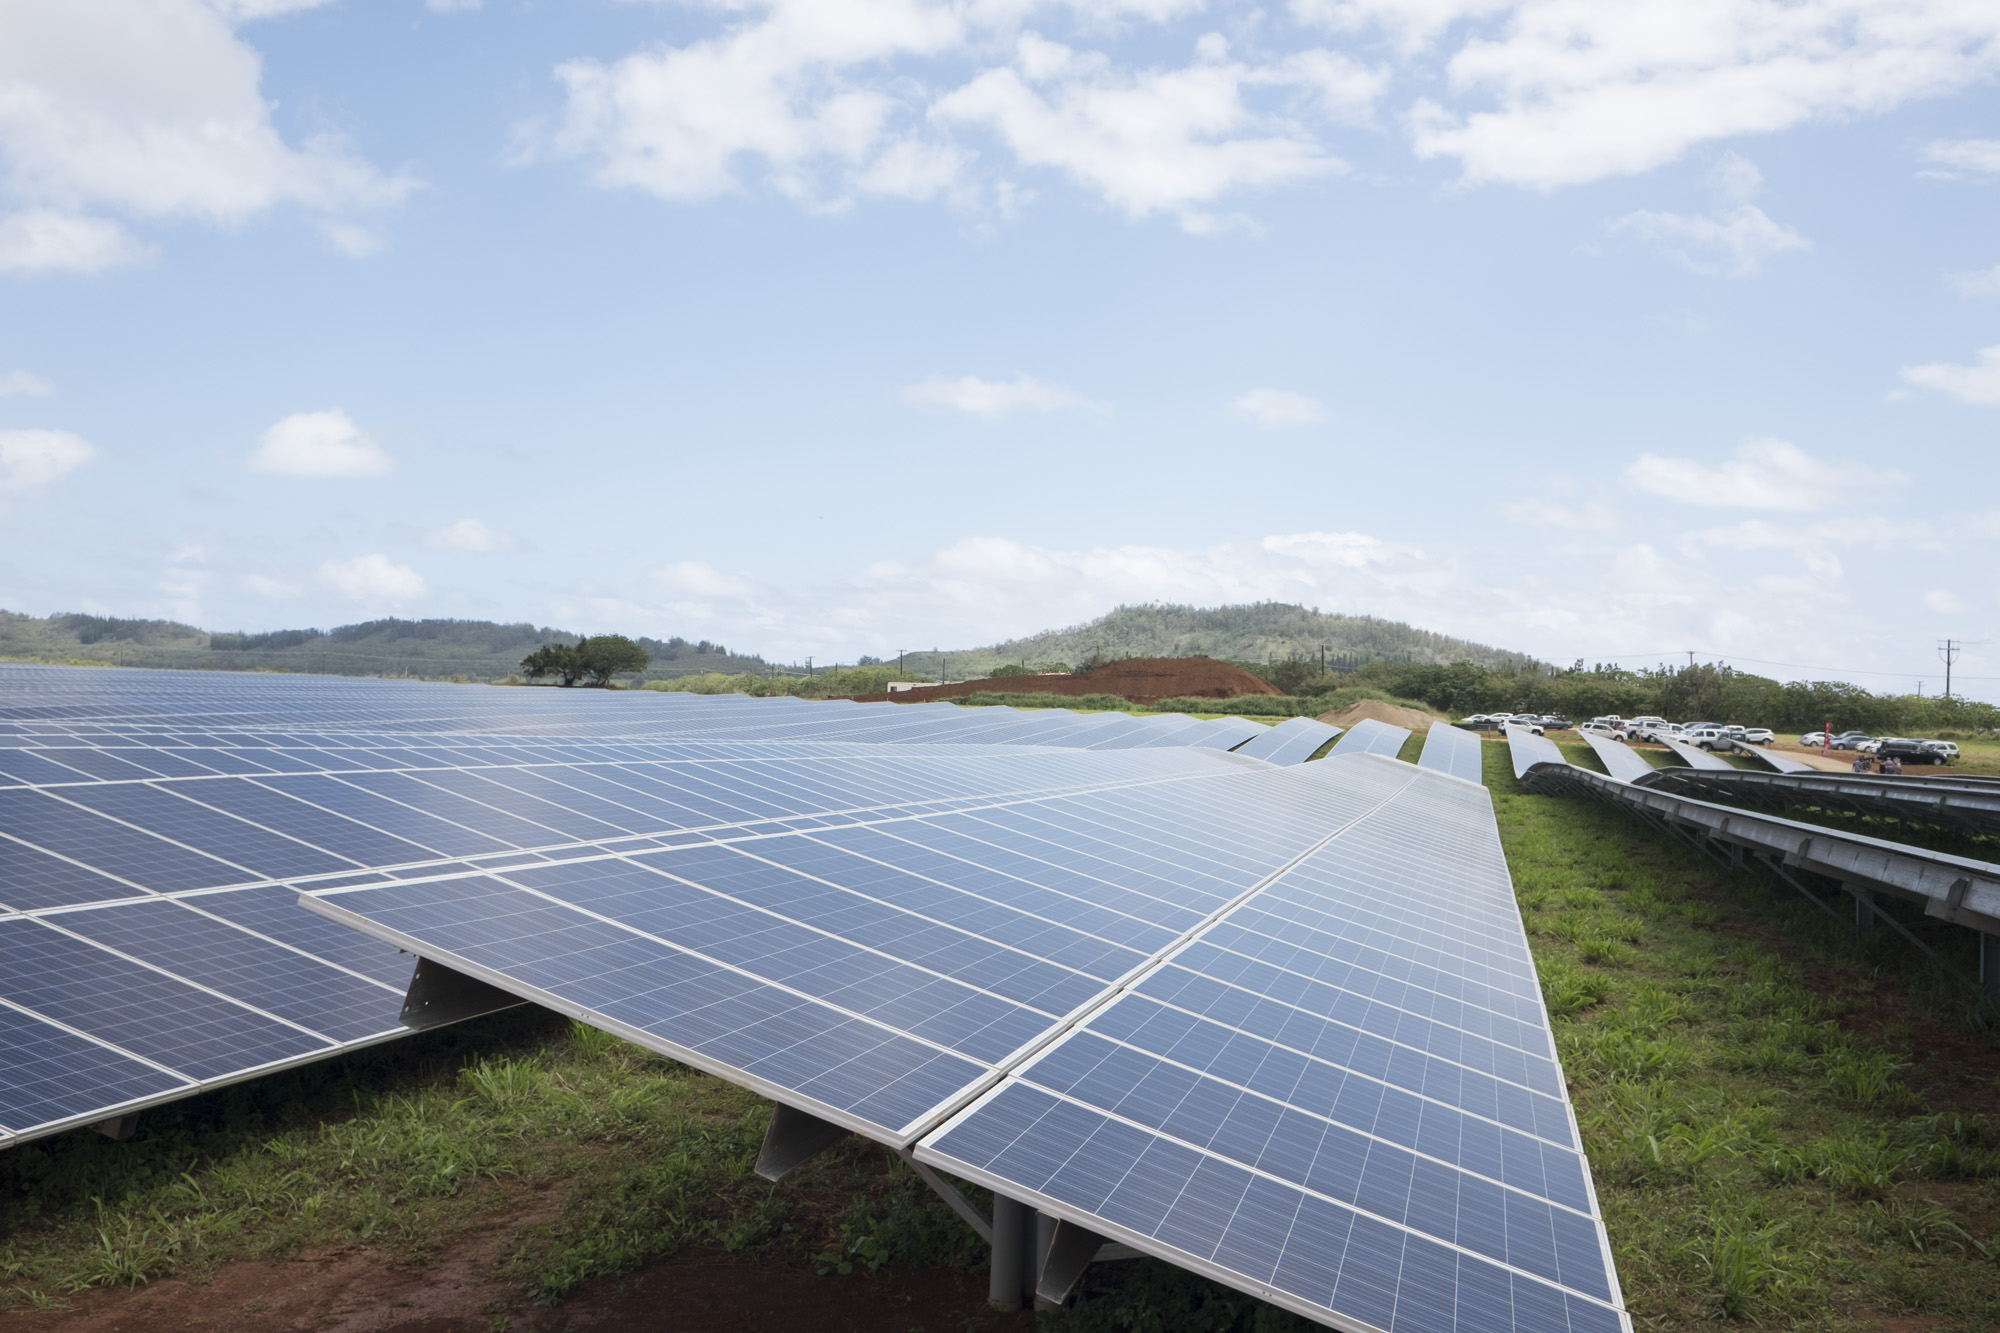 Tesla's Kauai solar storage facility offers a glimpse of the